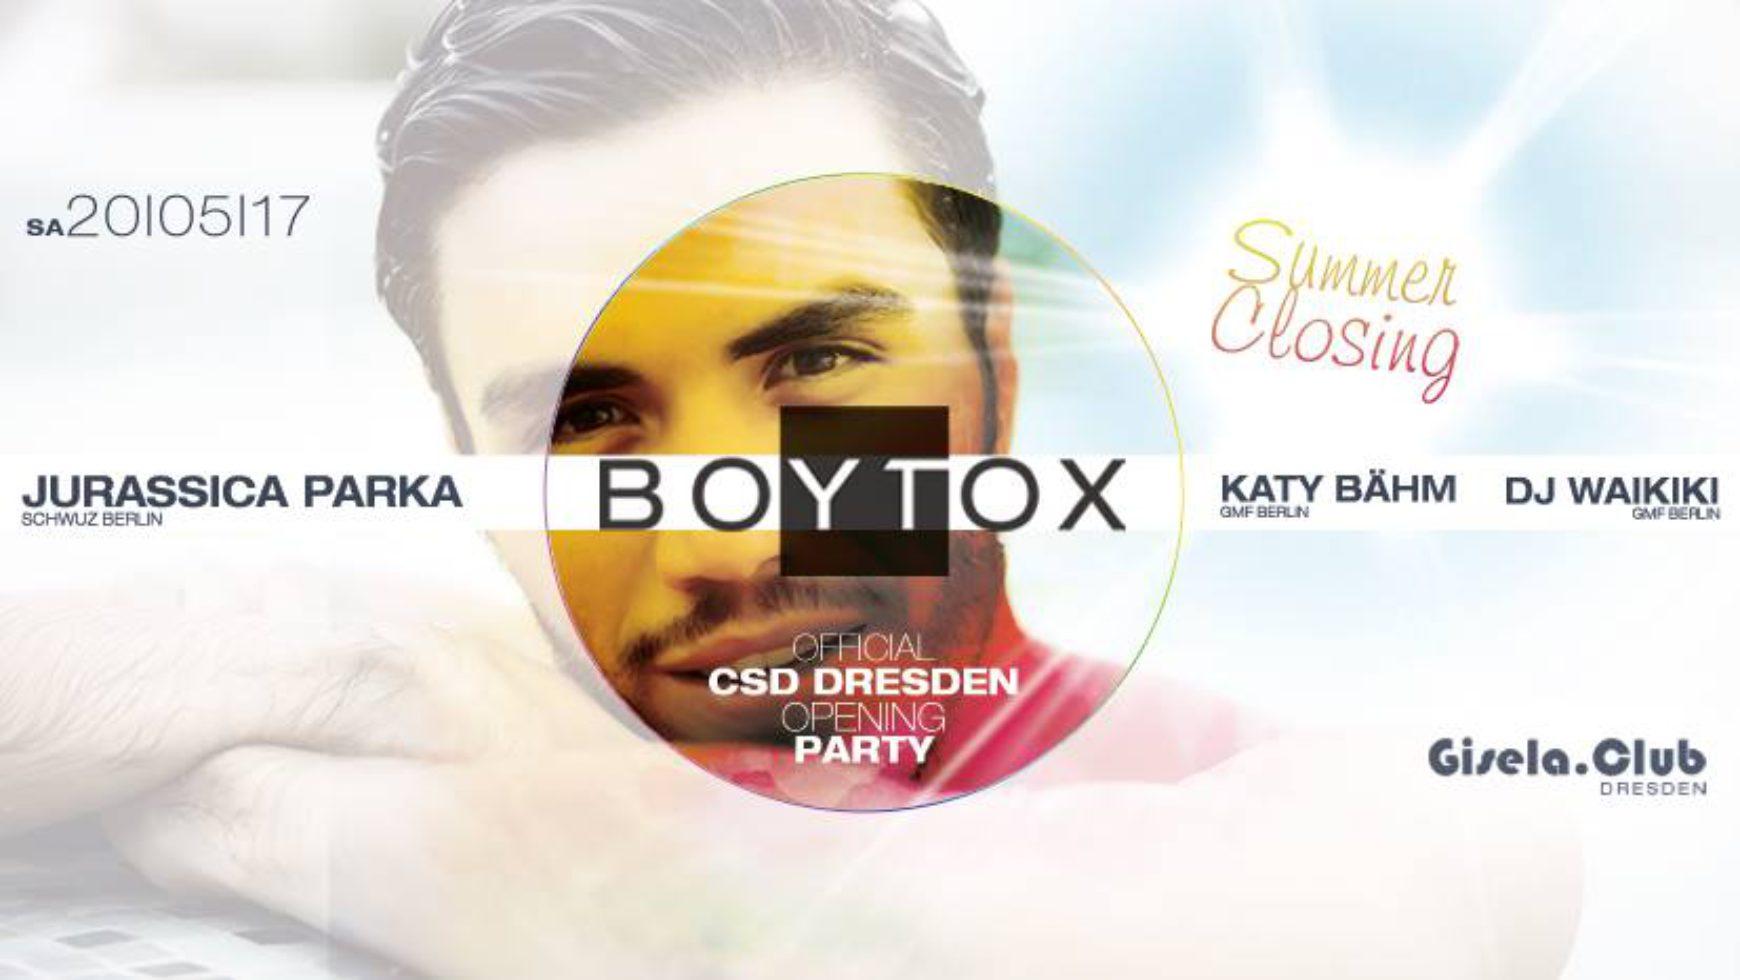 BOYTOX – Summer Closing – Die offizielle CSD Dresden Opening Party